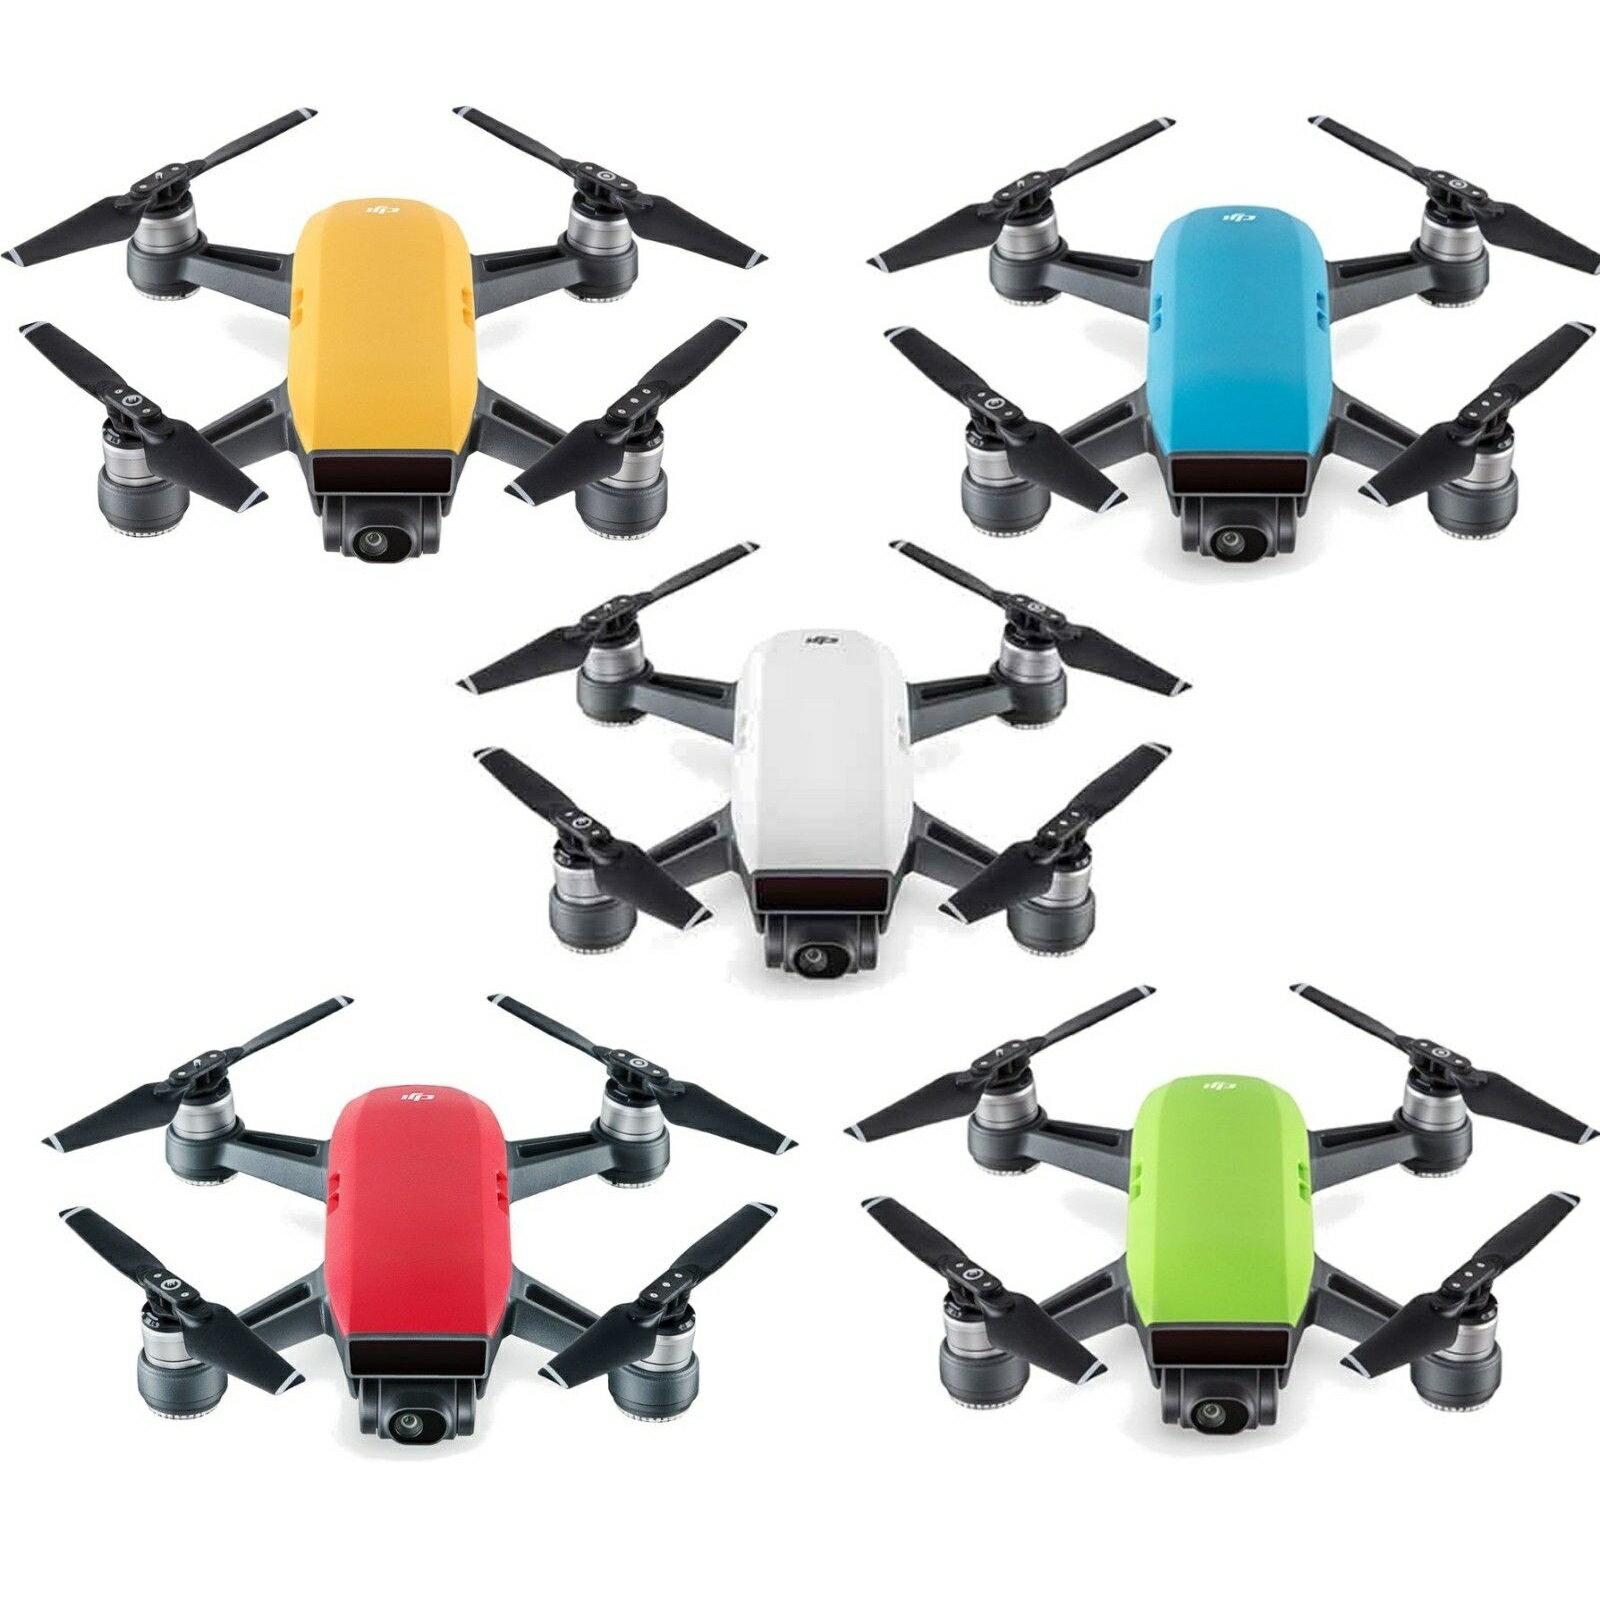 Promotion acheter drone martinique, avis drones gopro video